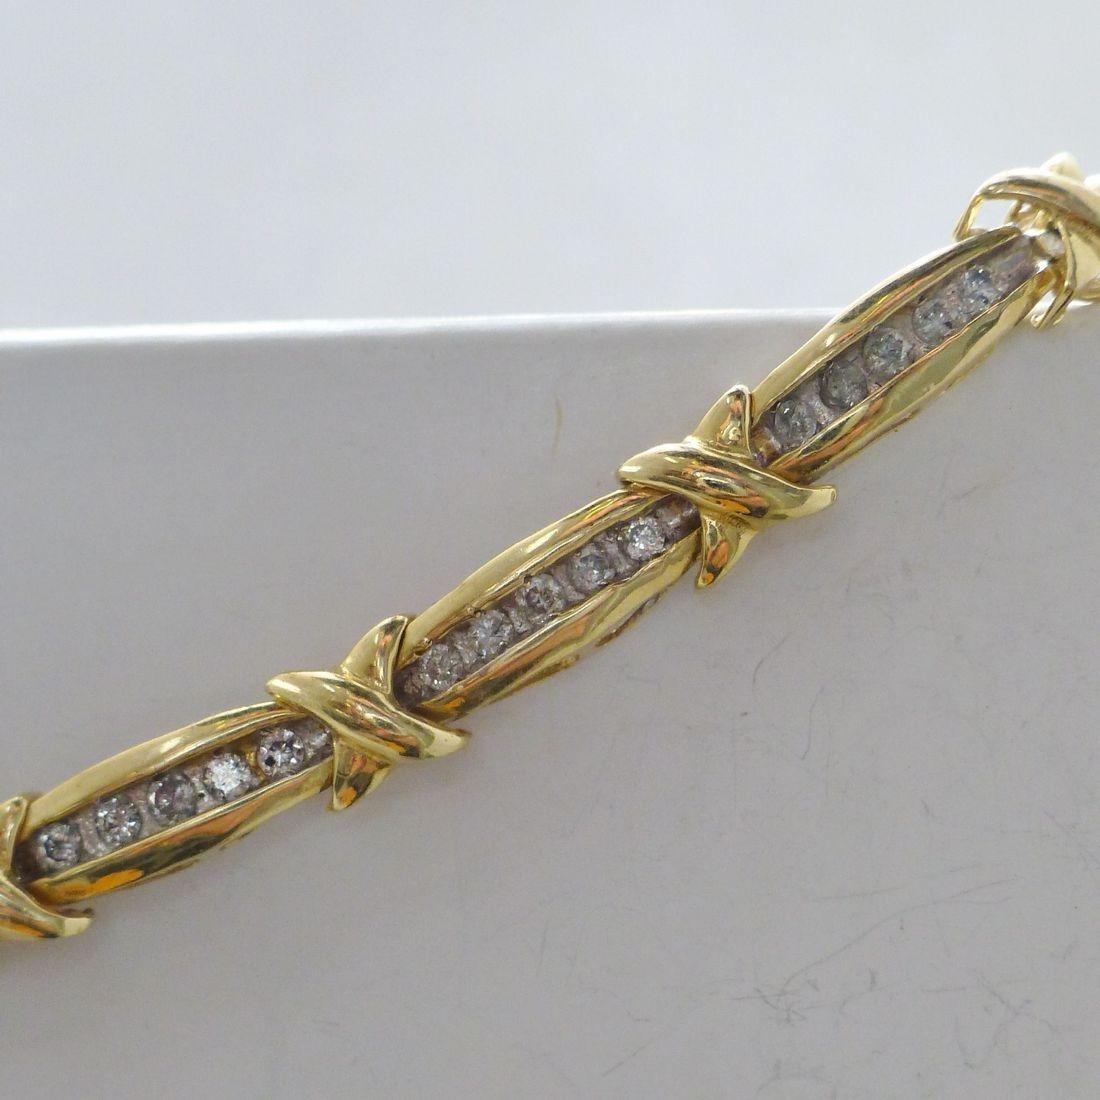 Yellow Gold Round Channel Set Diamond Tennis Bracelet Draped Across A White Box